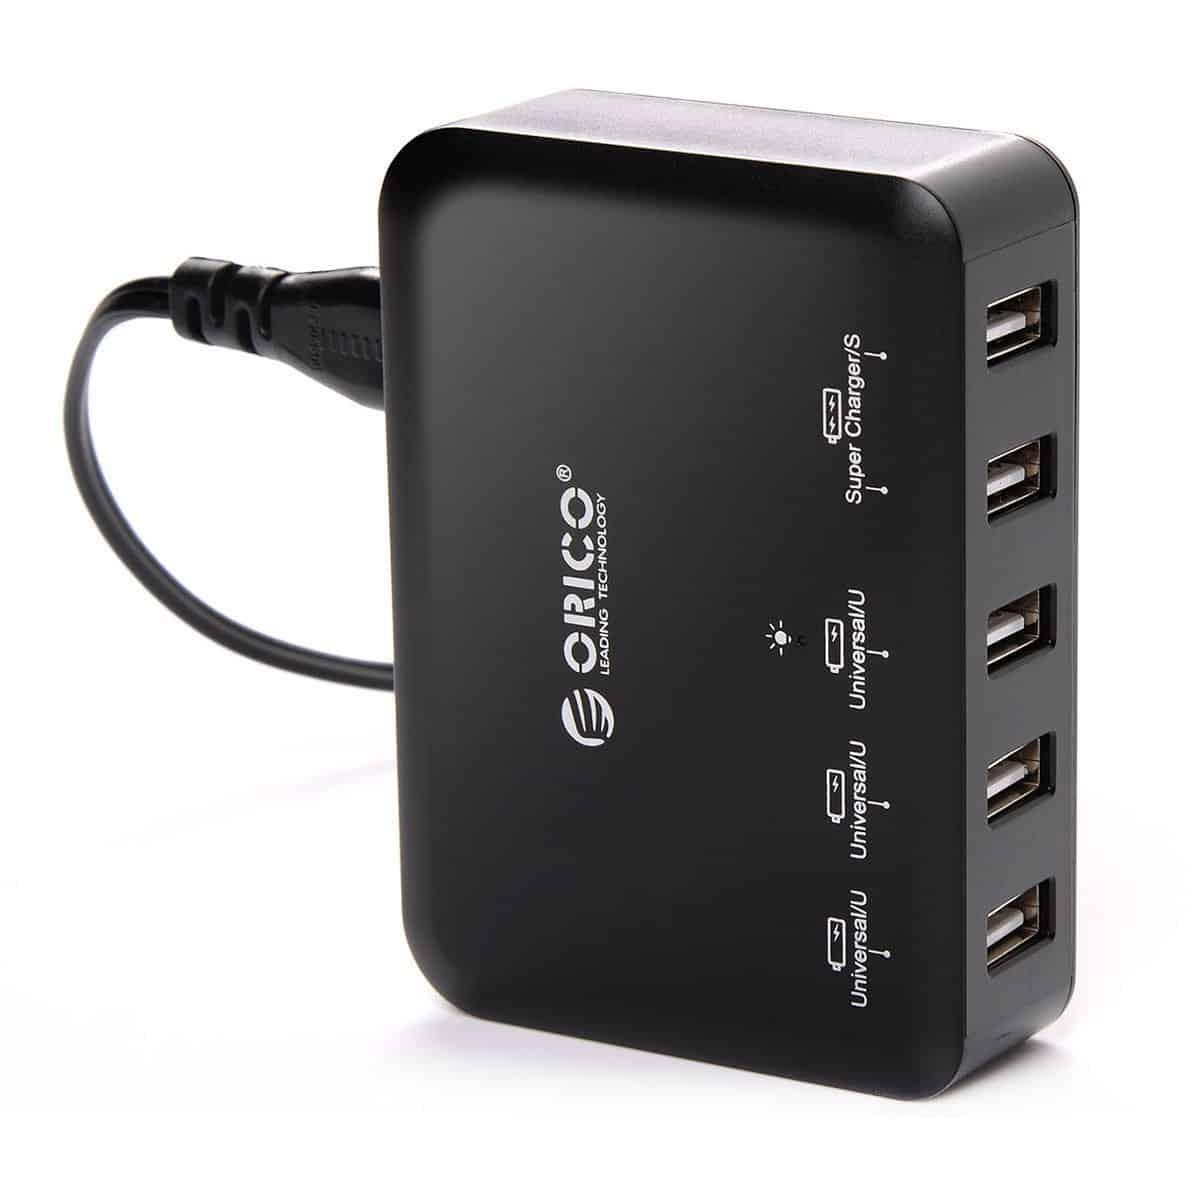 ORICO desktop charger deal